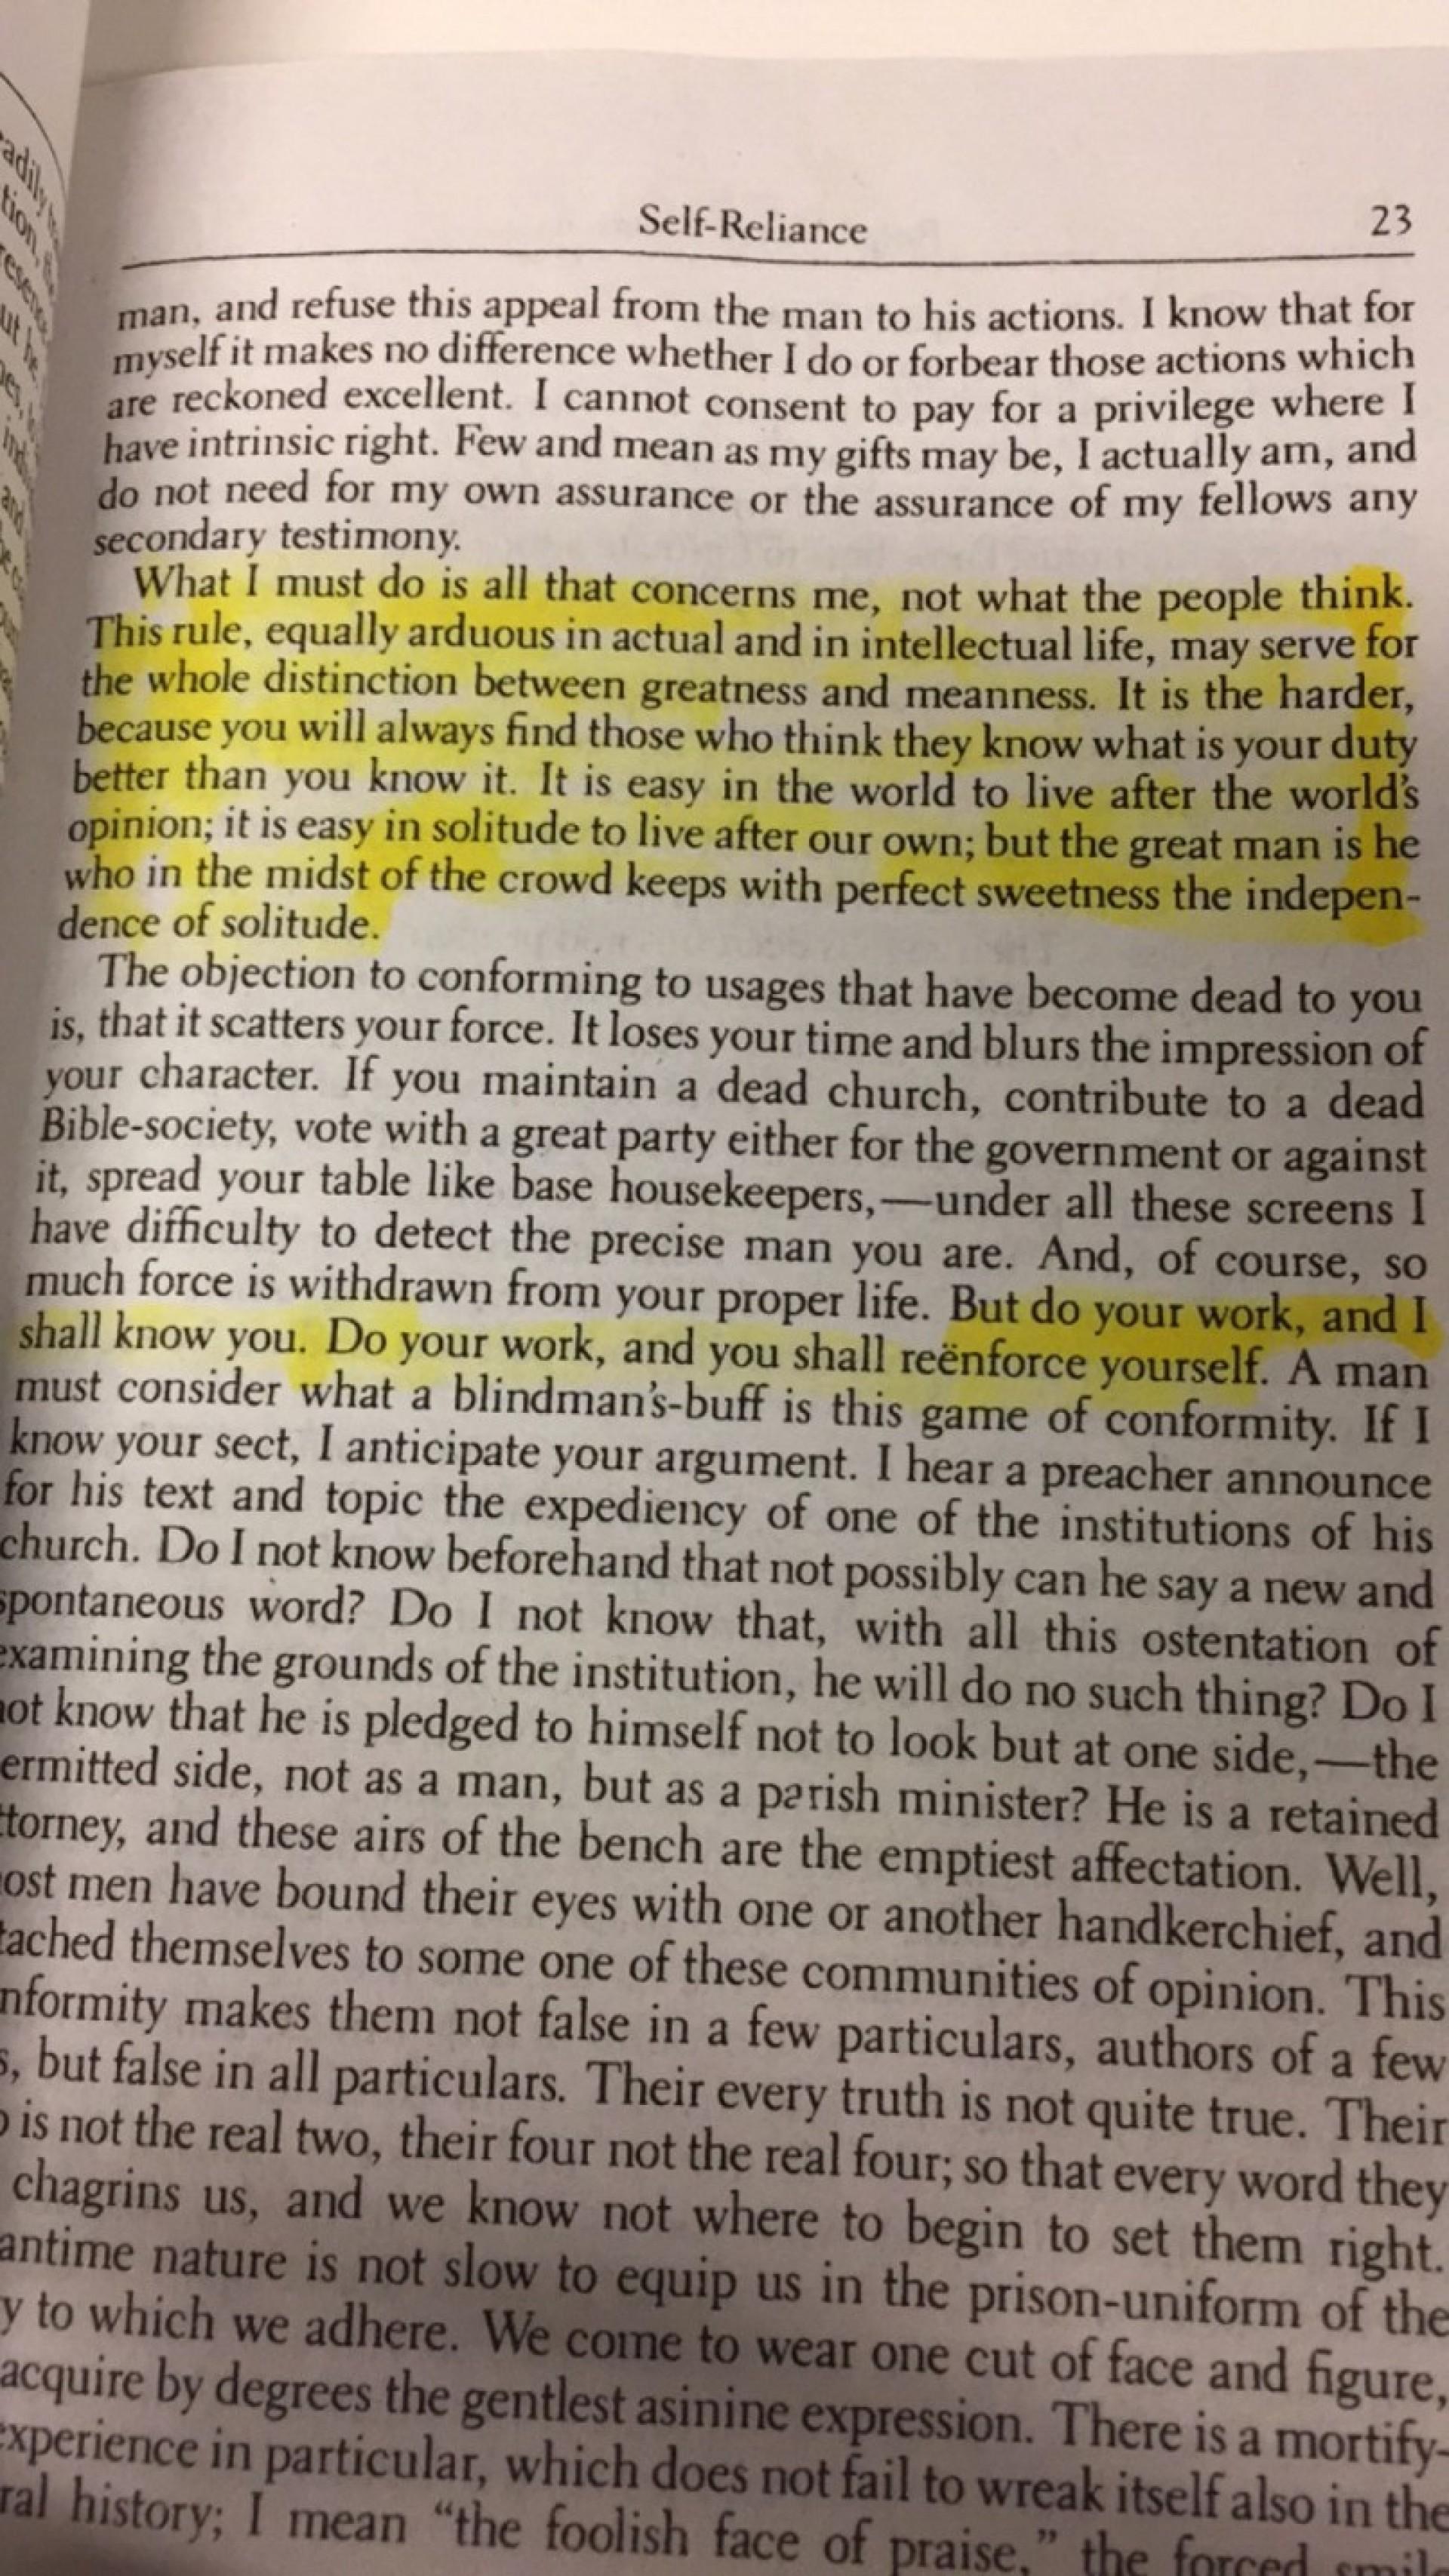 008 Self Reliance By Ralph Waldo Emerson Summaryresize8062c1433 Essay Staggering Summary Translated Into Modern English Analysis 1920